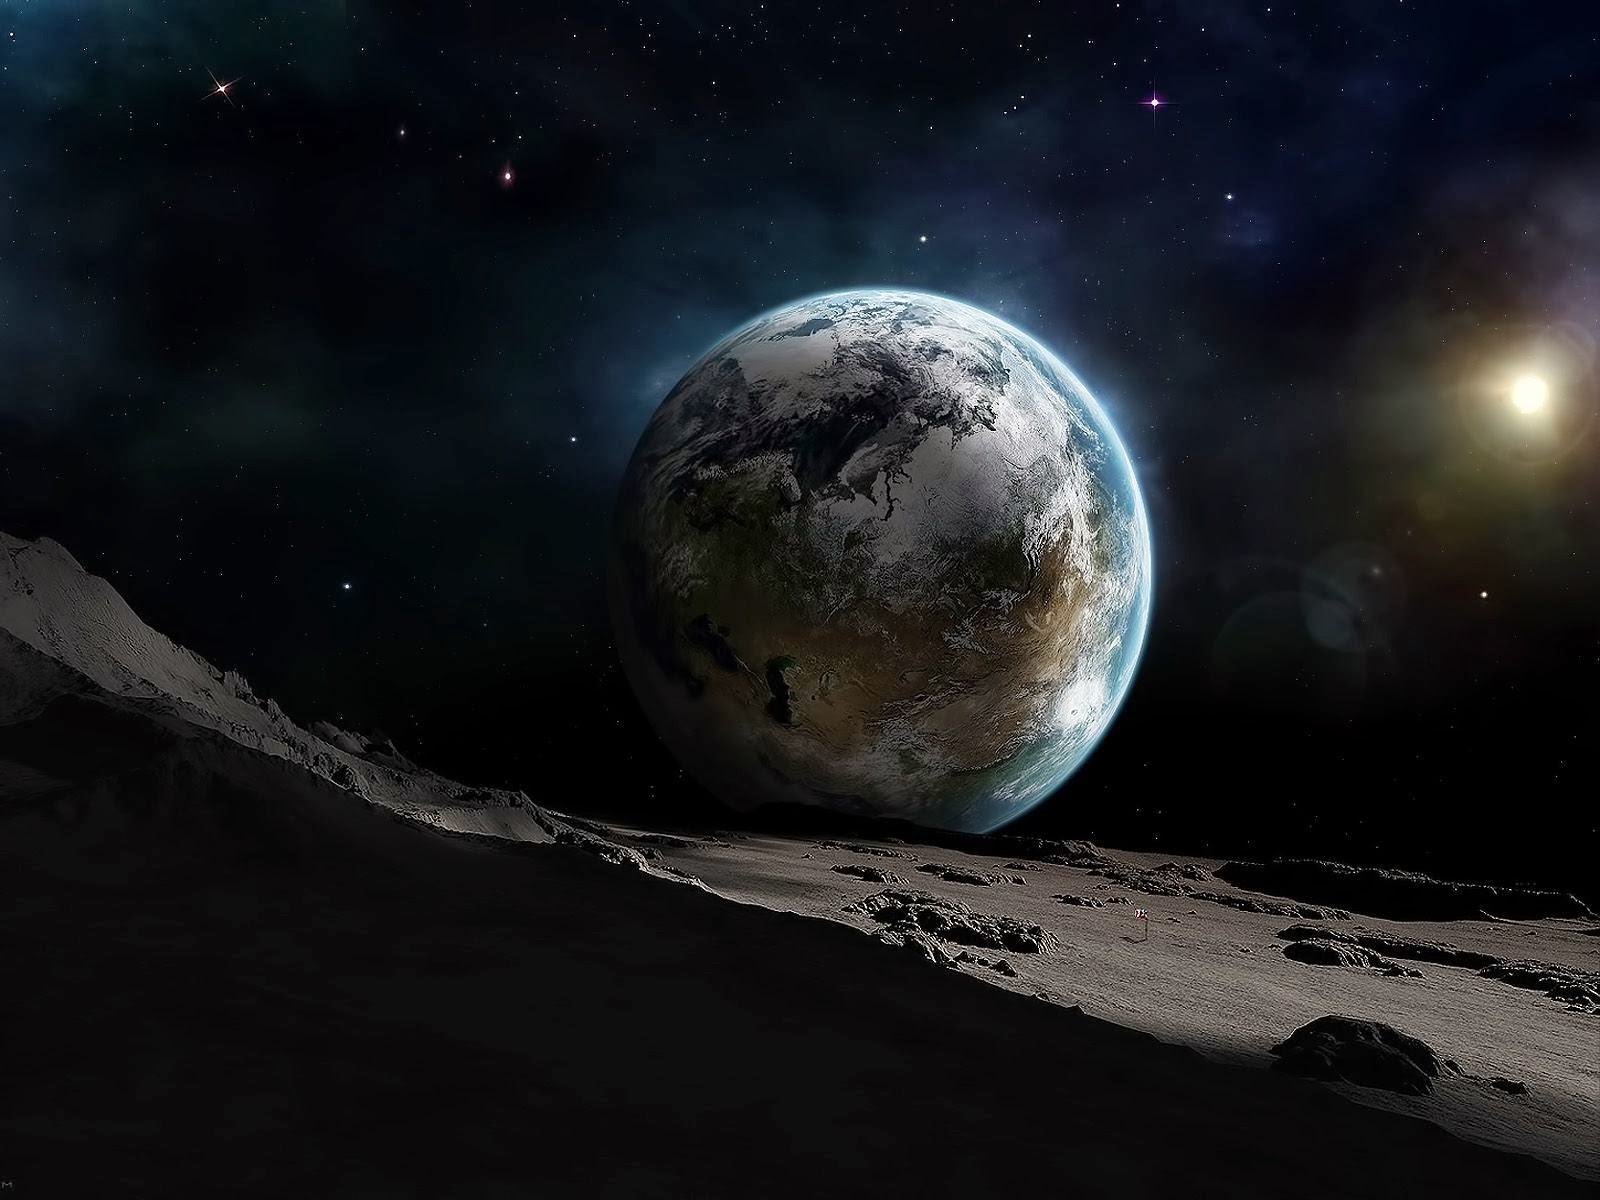 [Image: herth-nasa-earth-science-pics-windows-hd-168227.jpg]